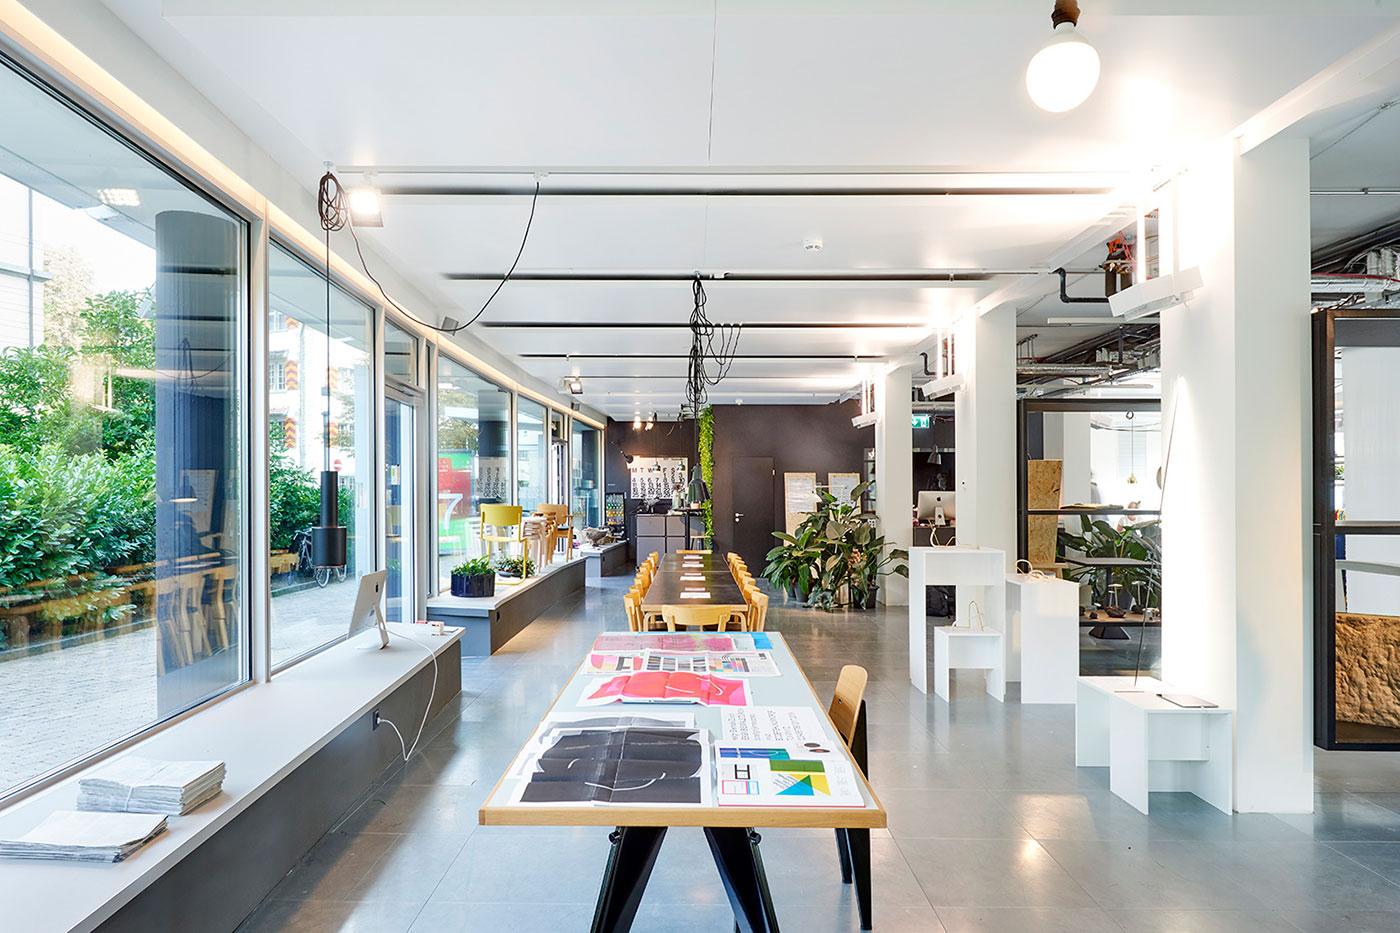 Design Biennale Zürich 2017, ISOnewspaper26v4, Jaques Borel & Guillaume Mojon (Foto: Luca Zanier)